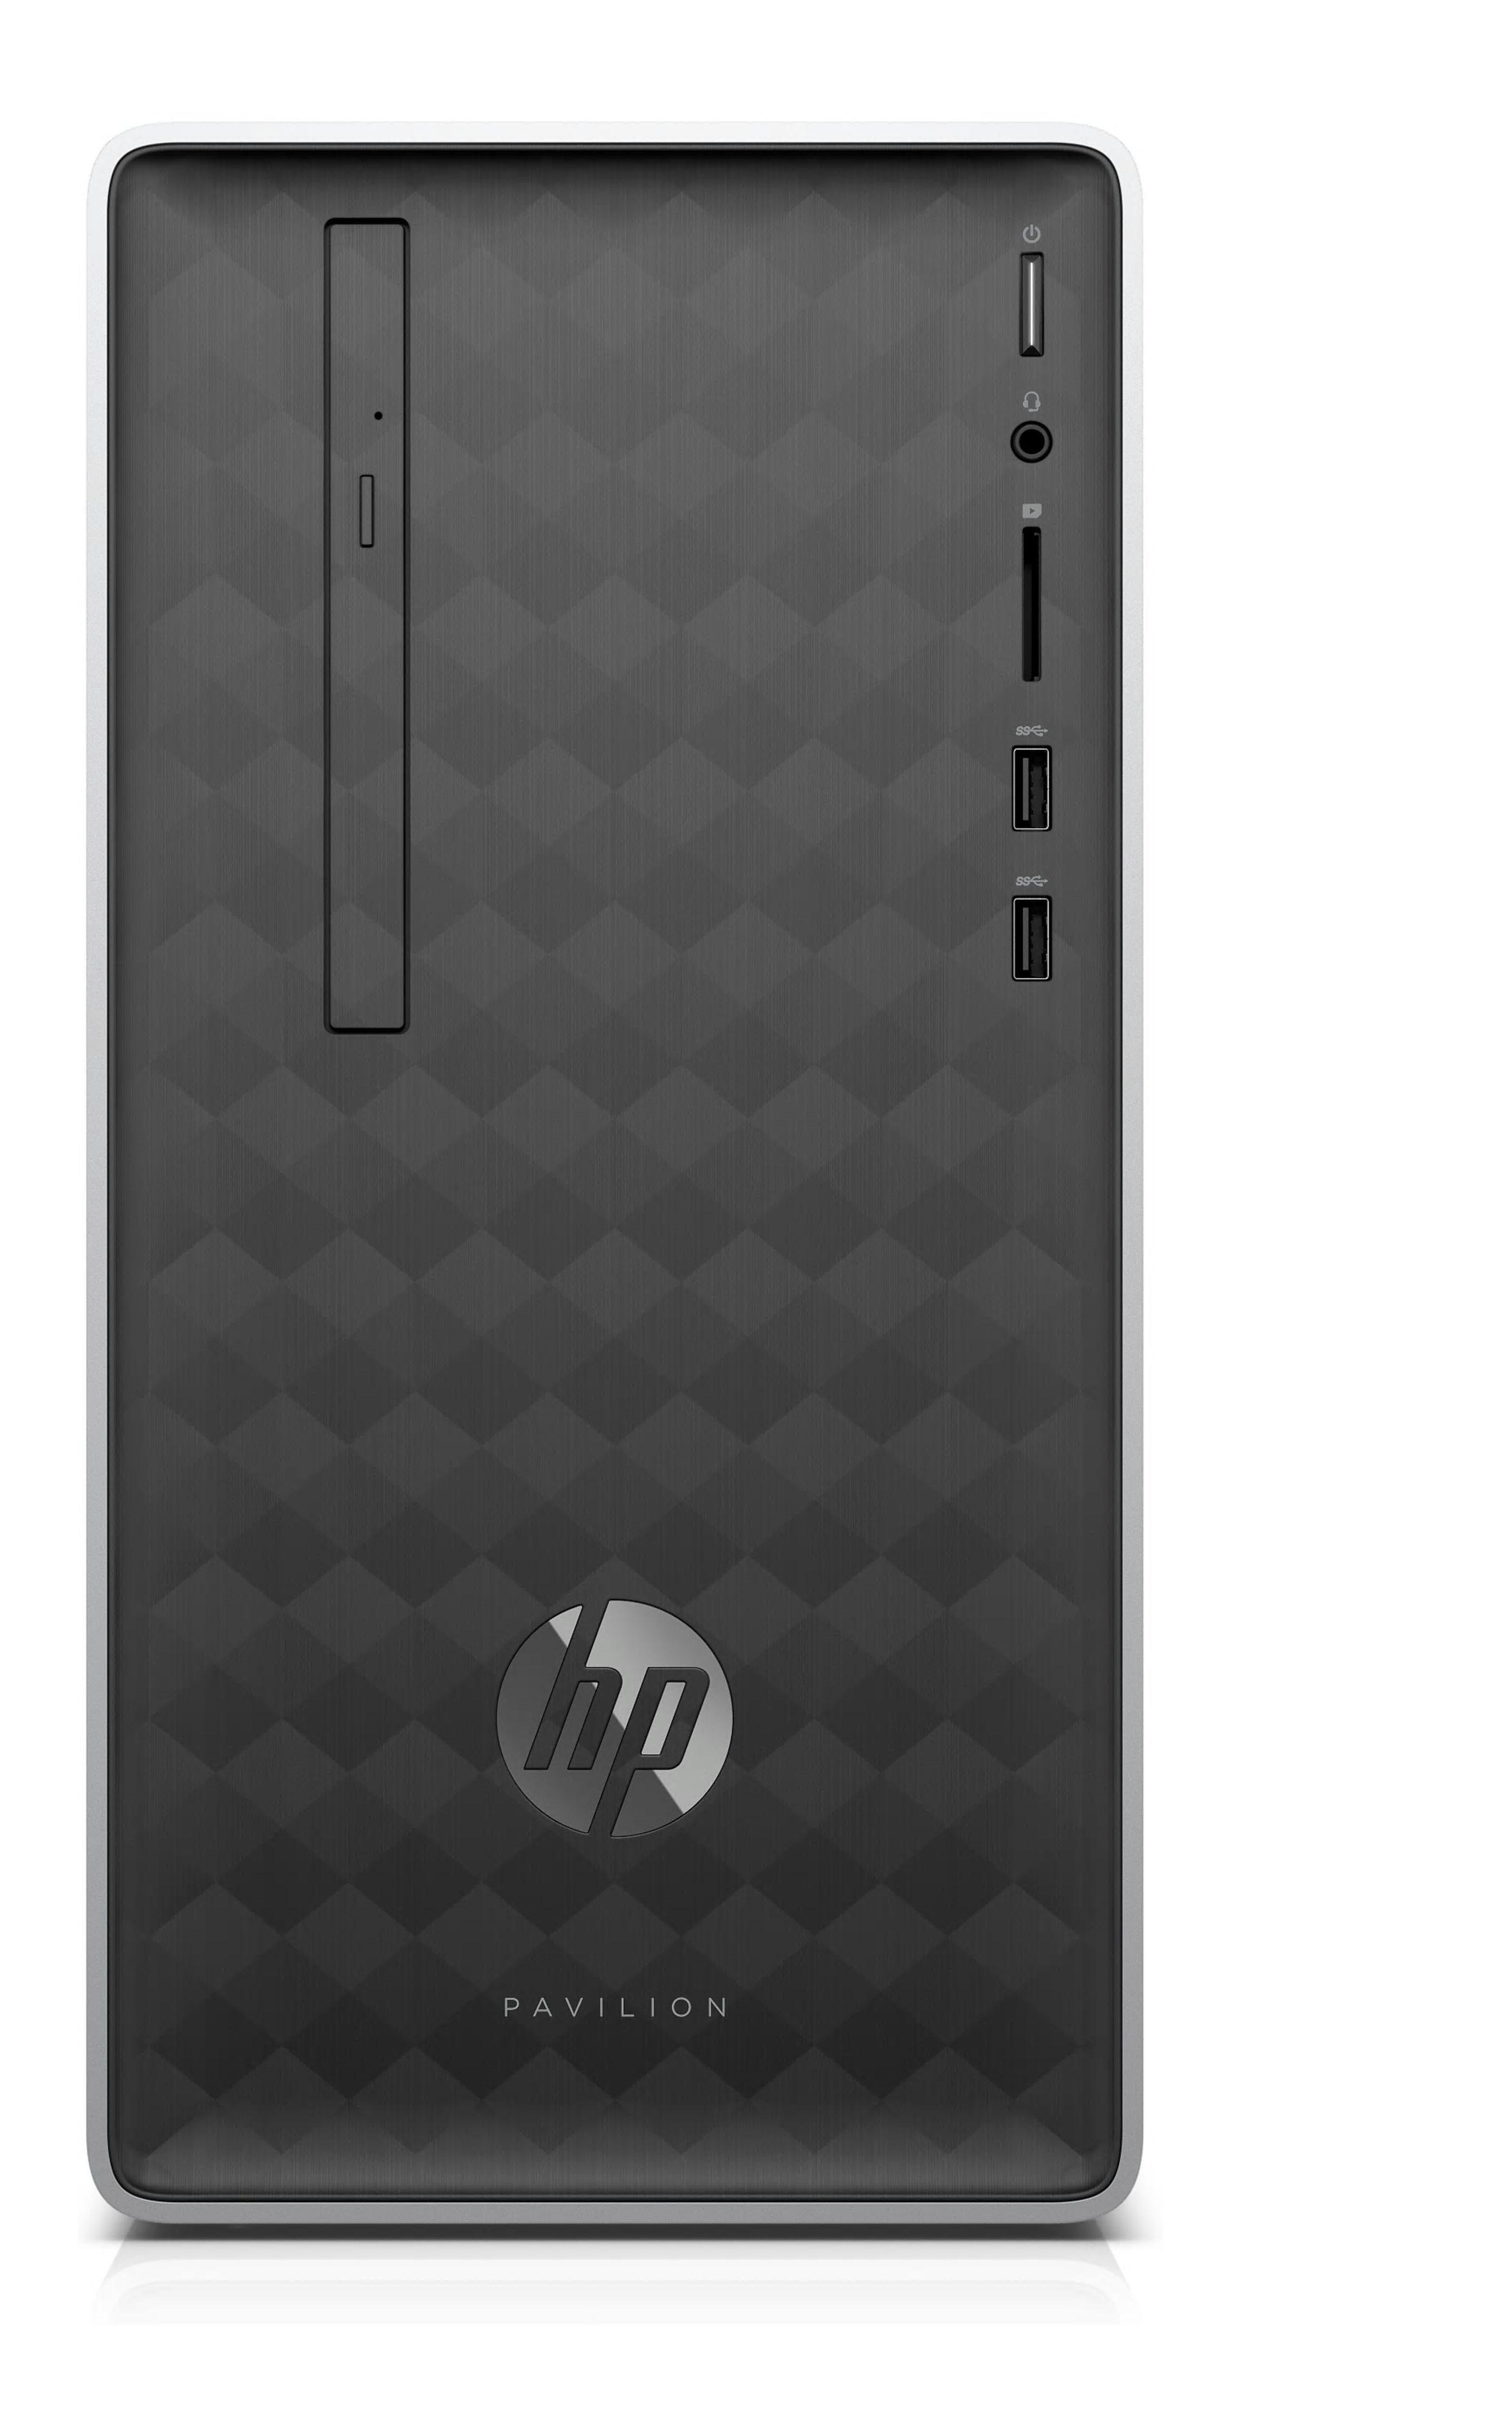 HP Pavilion 590-a0514ng Desktop PC »AMD Dual-Core A9, AMD Radeon R5,256GB+1 TB, 8 GB«